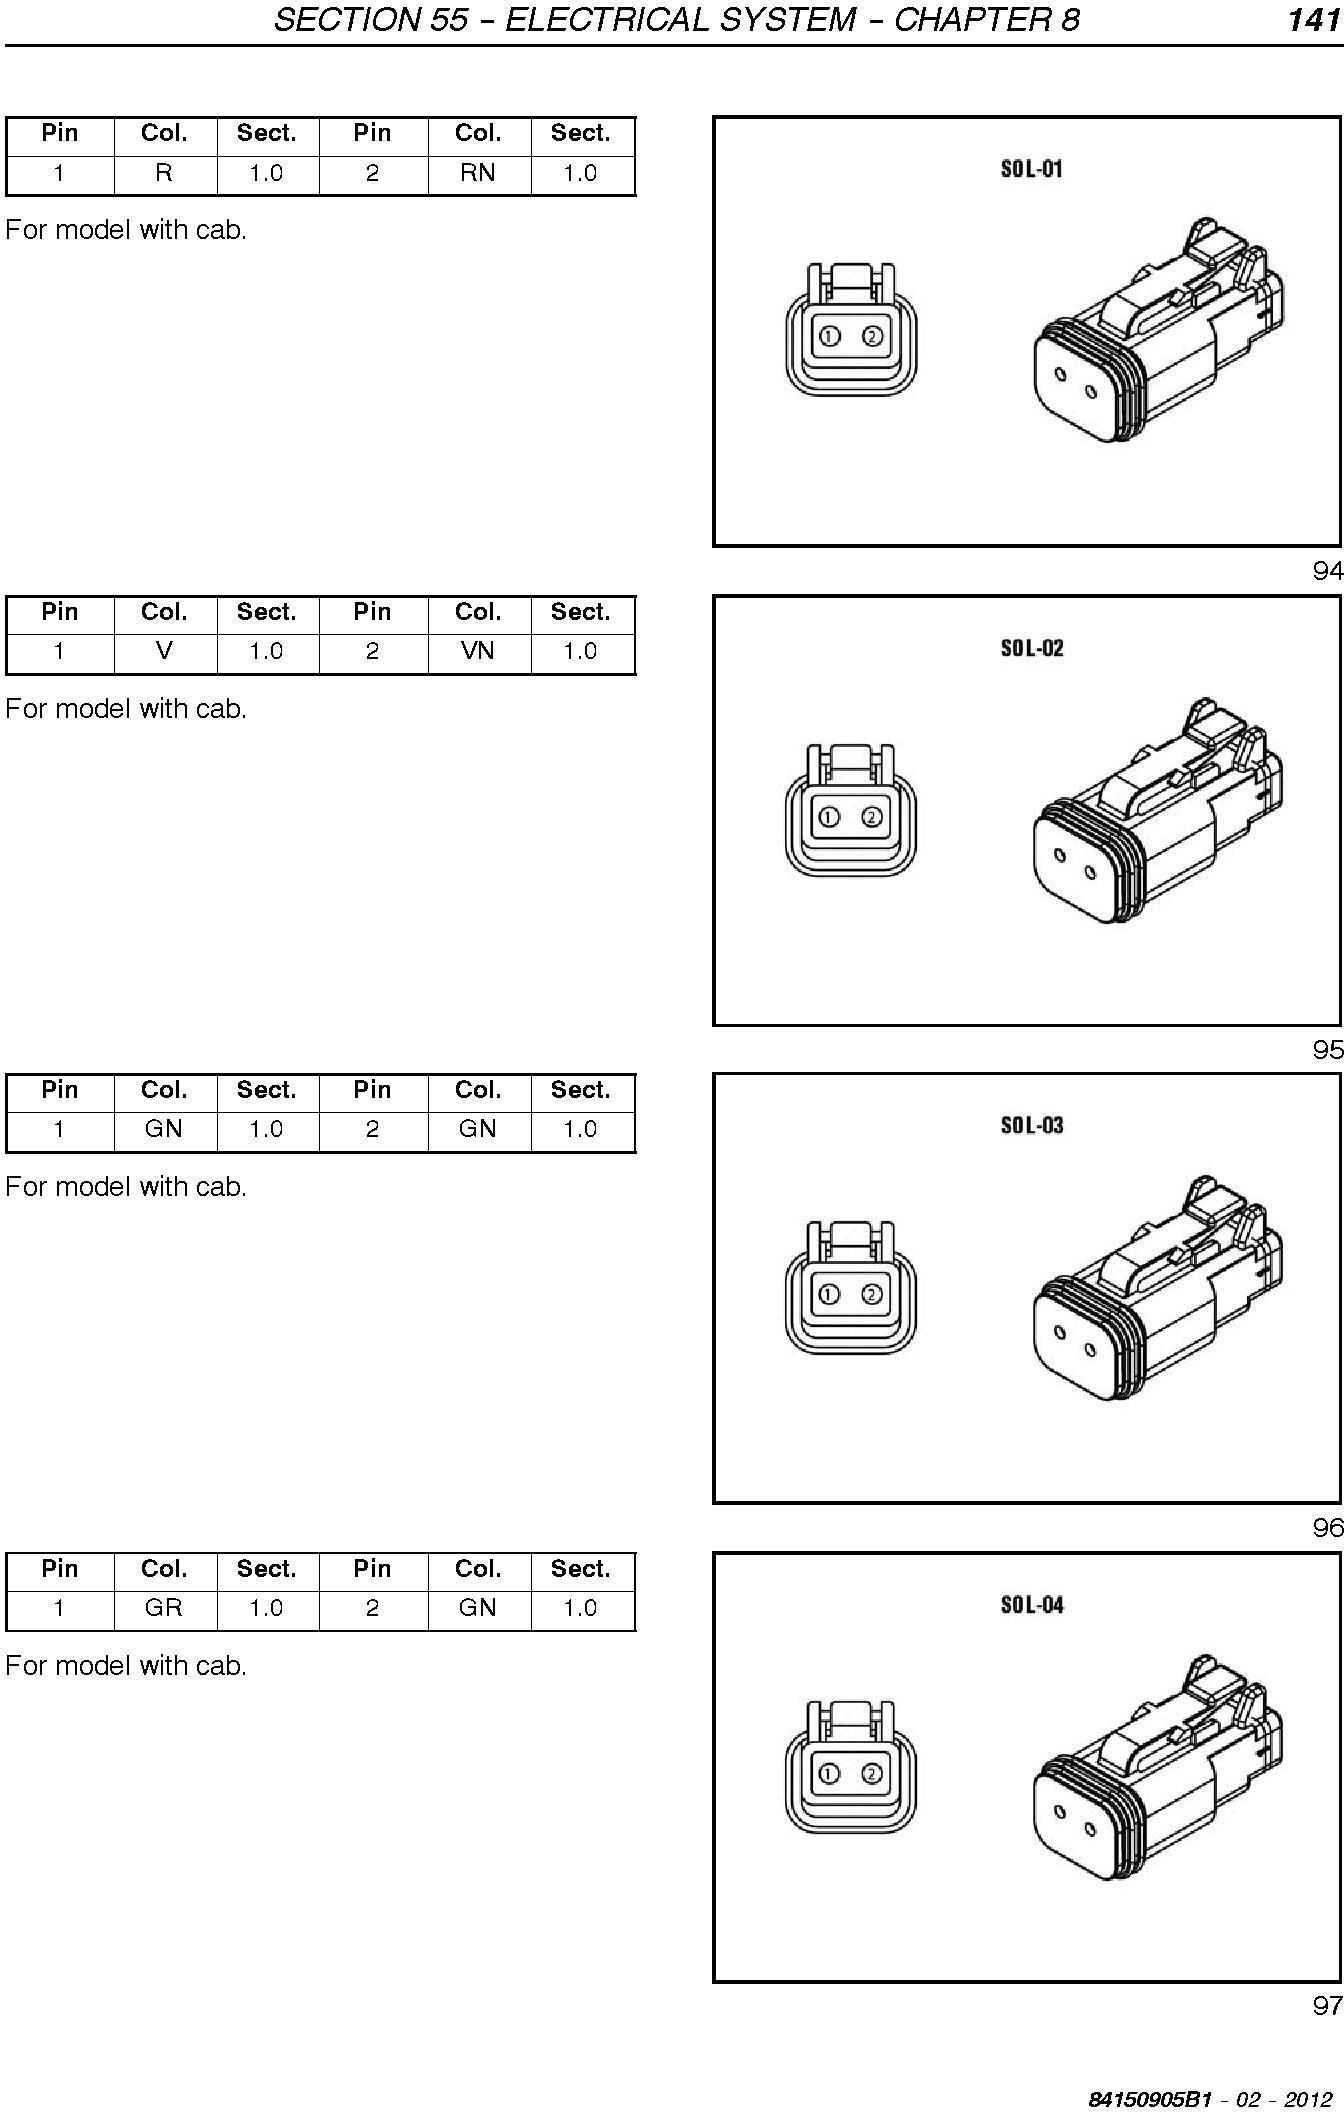 New Holland T4020V, T4030V/N, T4040V/N, T4050V/N, T4060V/N Tractor Service Manual - 3